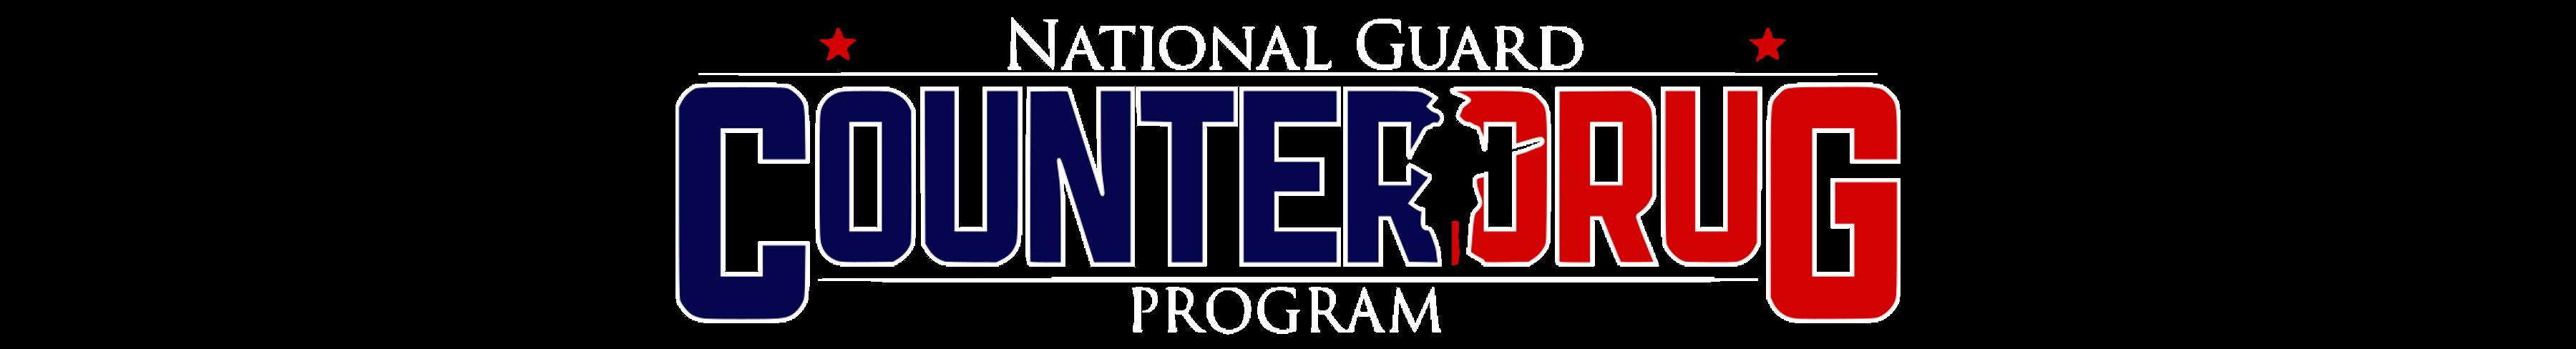 NGB Logo Header Image.png